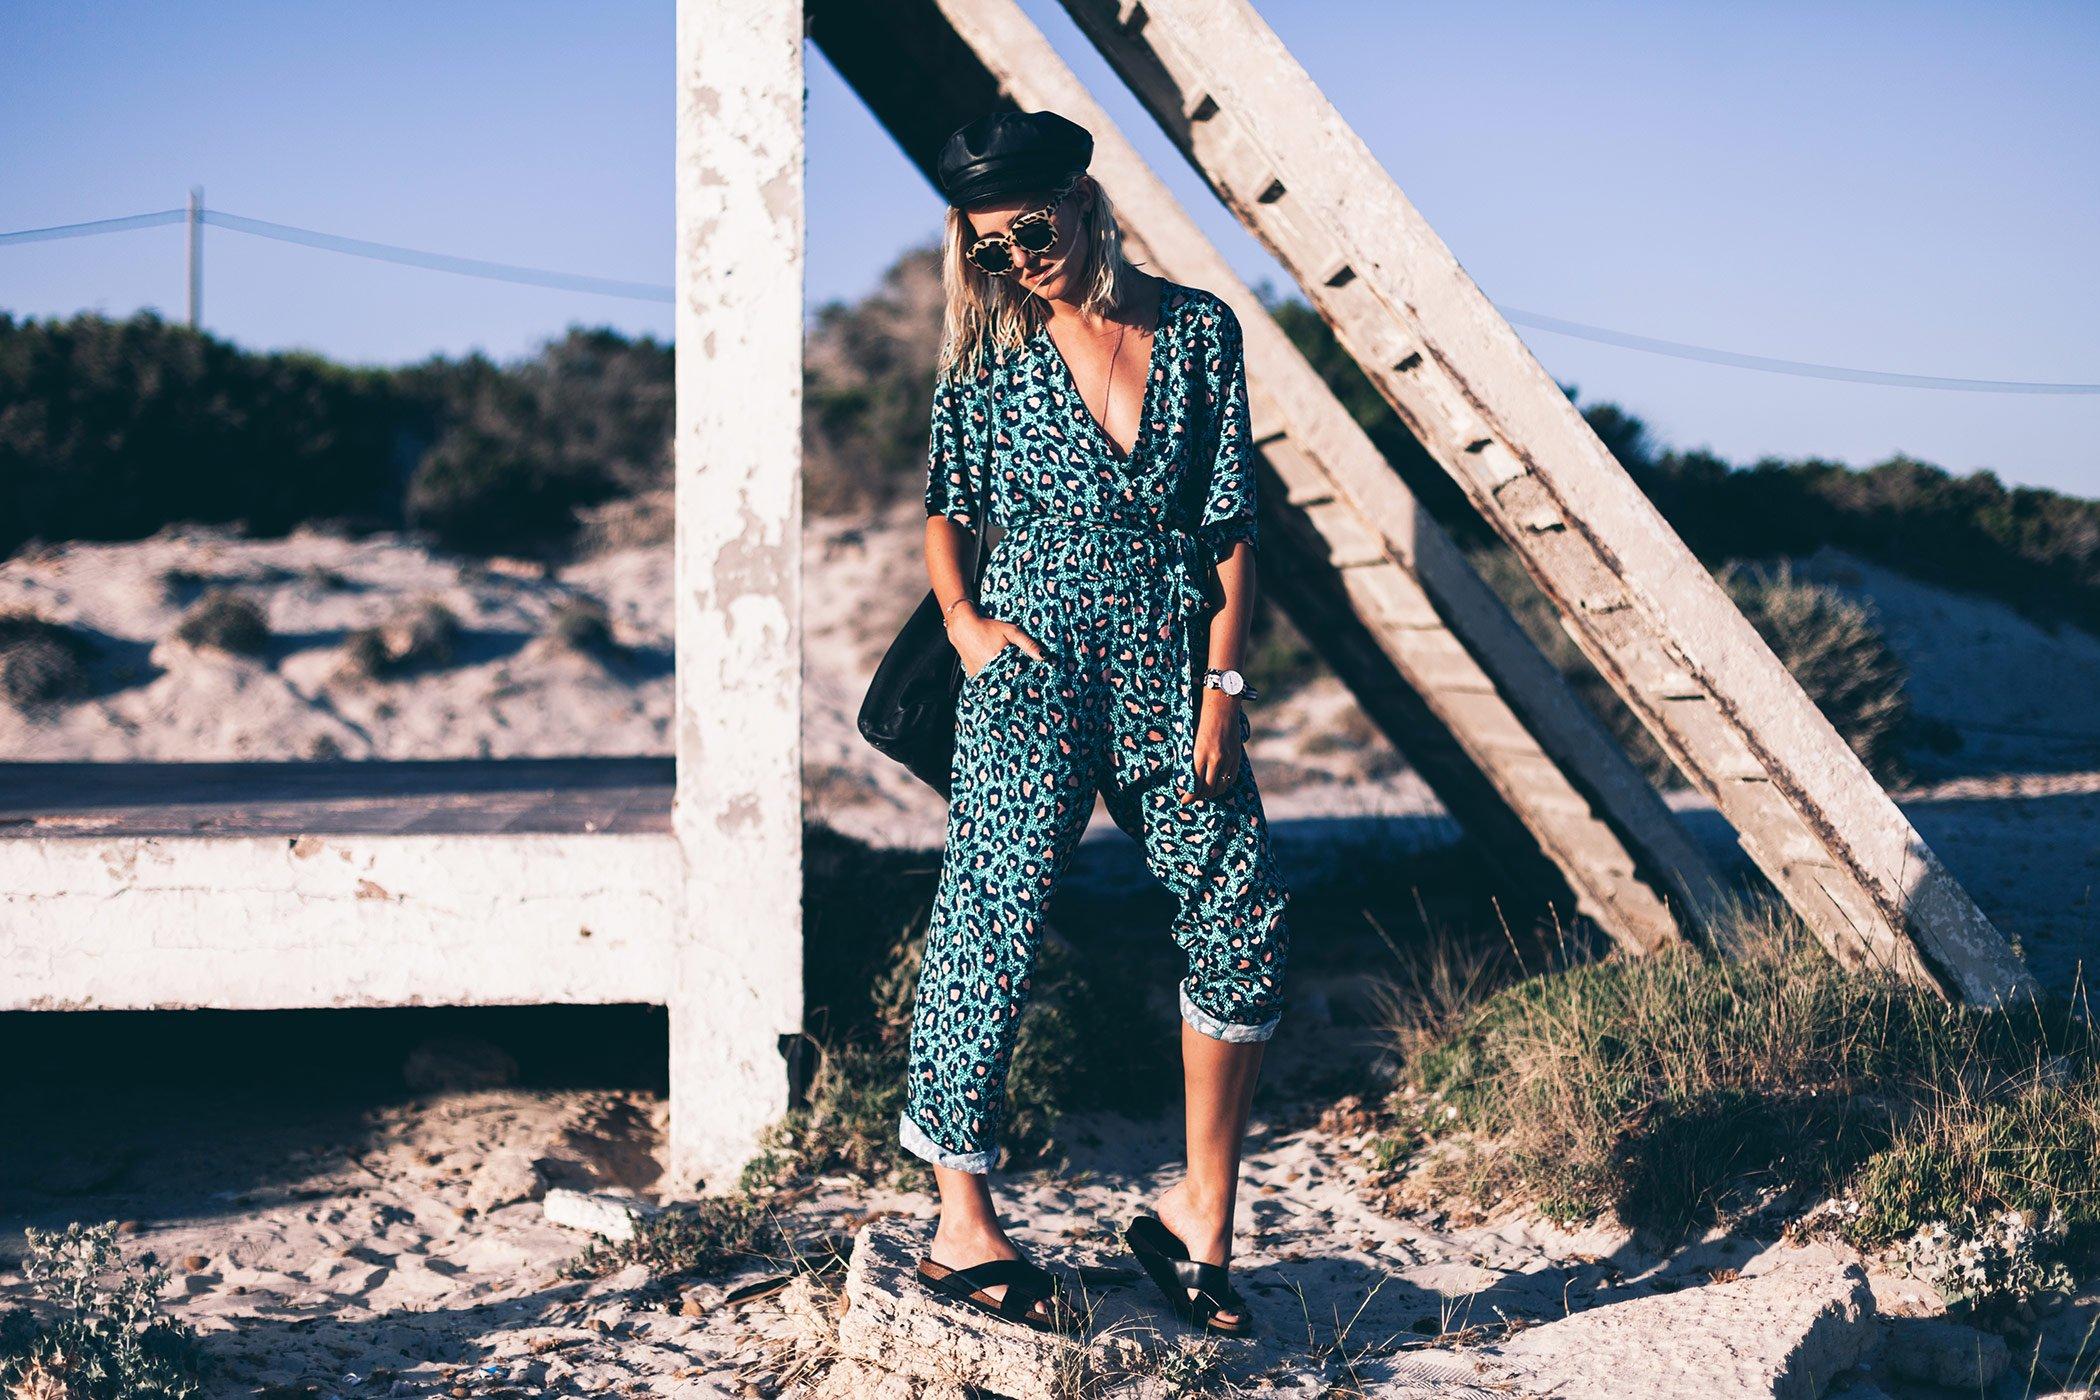 mikuta in a leopard jumpsuit